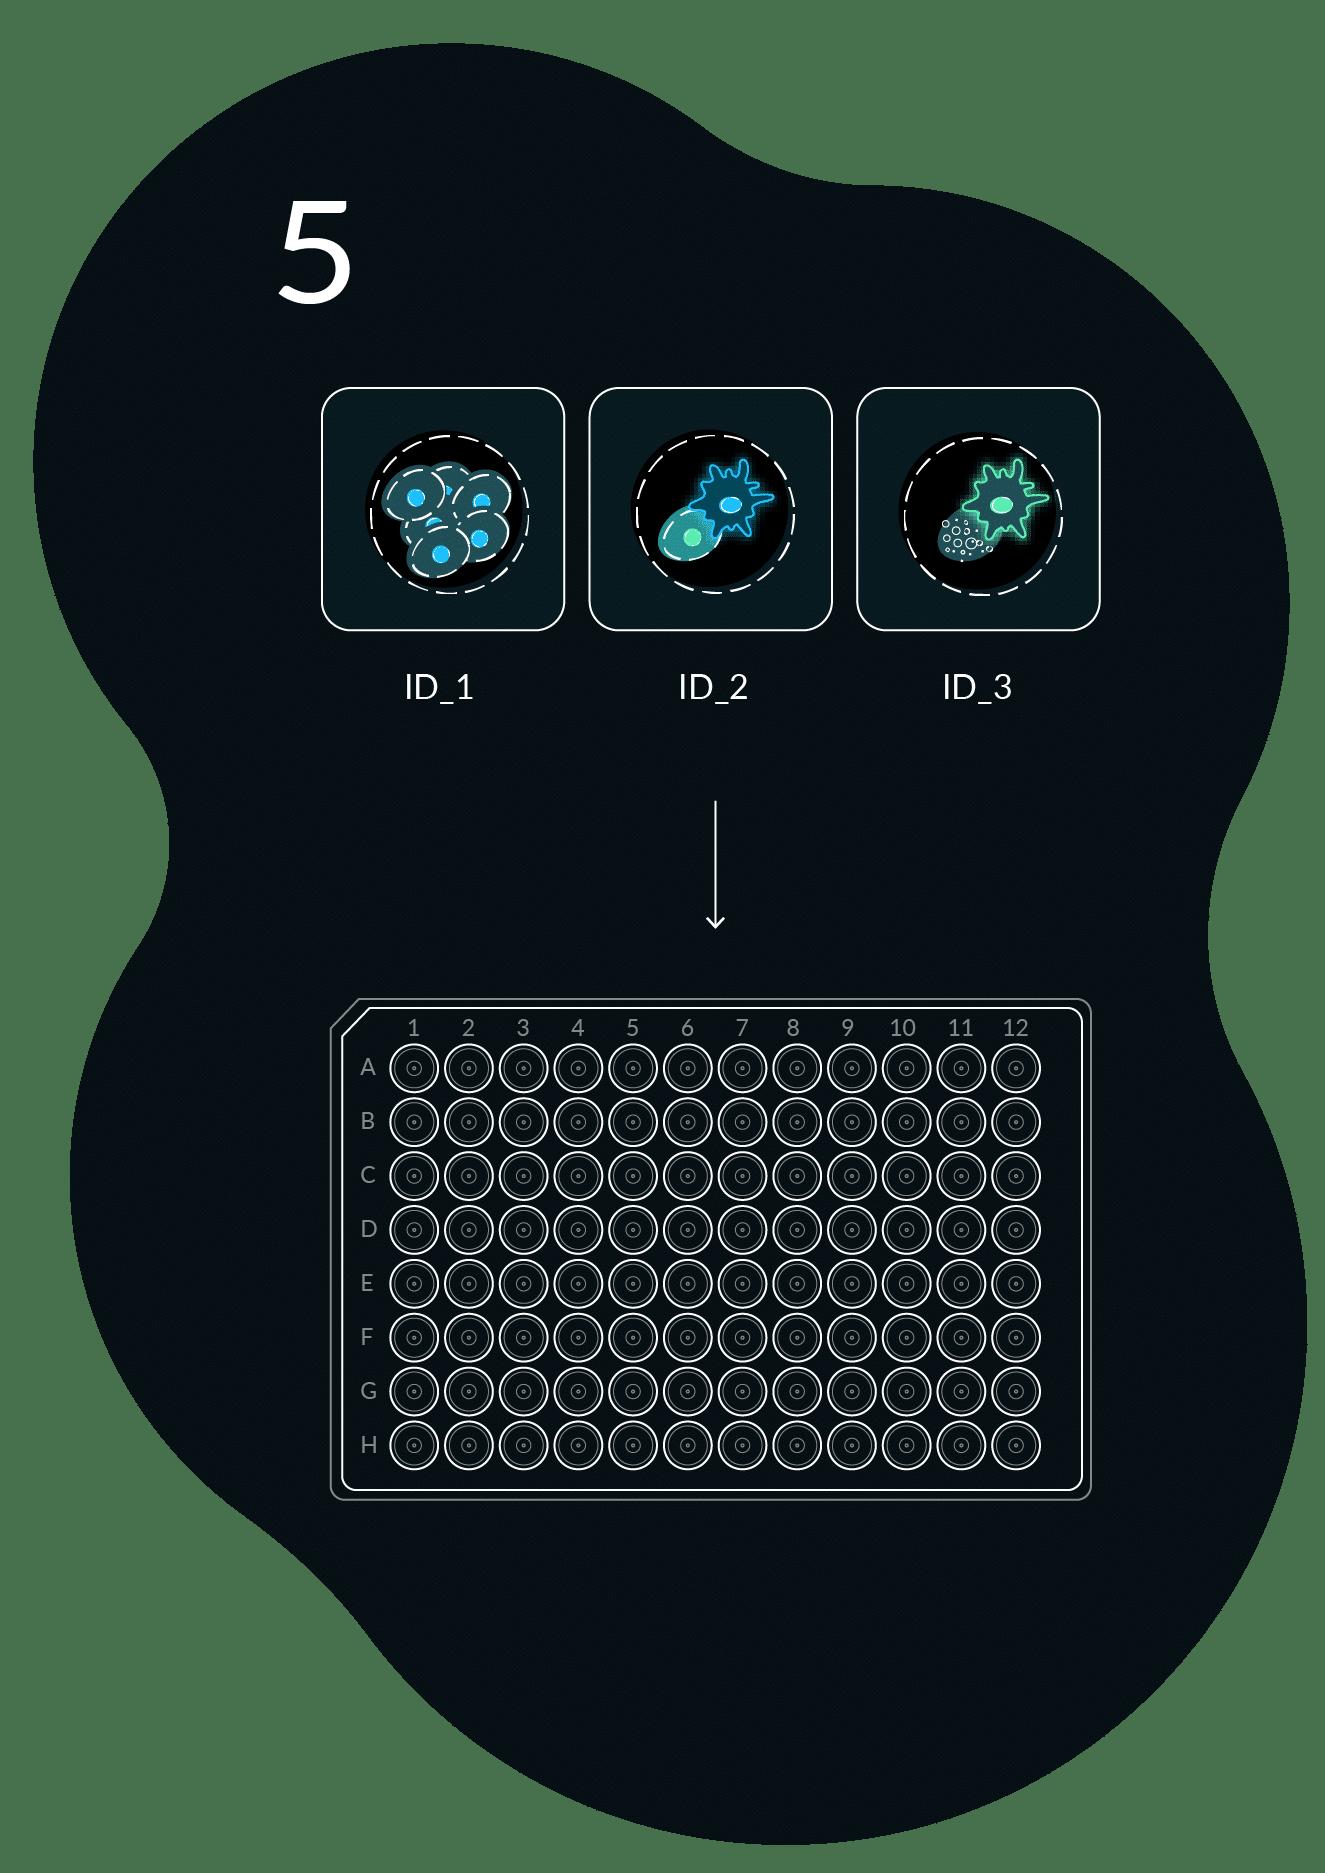 Workflow Image 5 Cell Retrieval